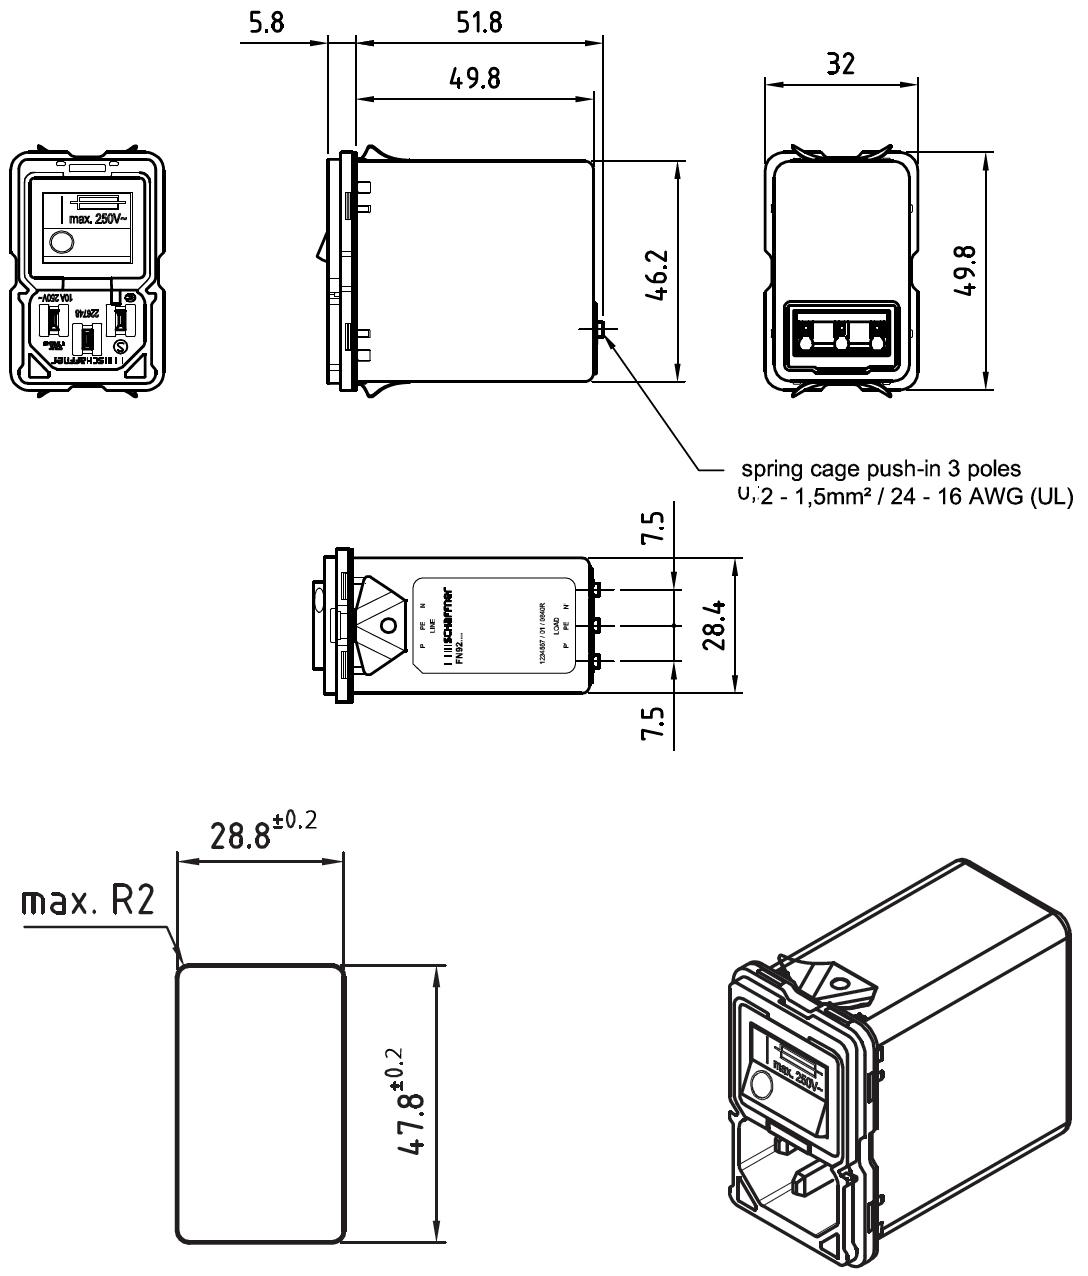 mars 10589 wiring diagram